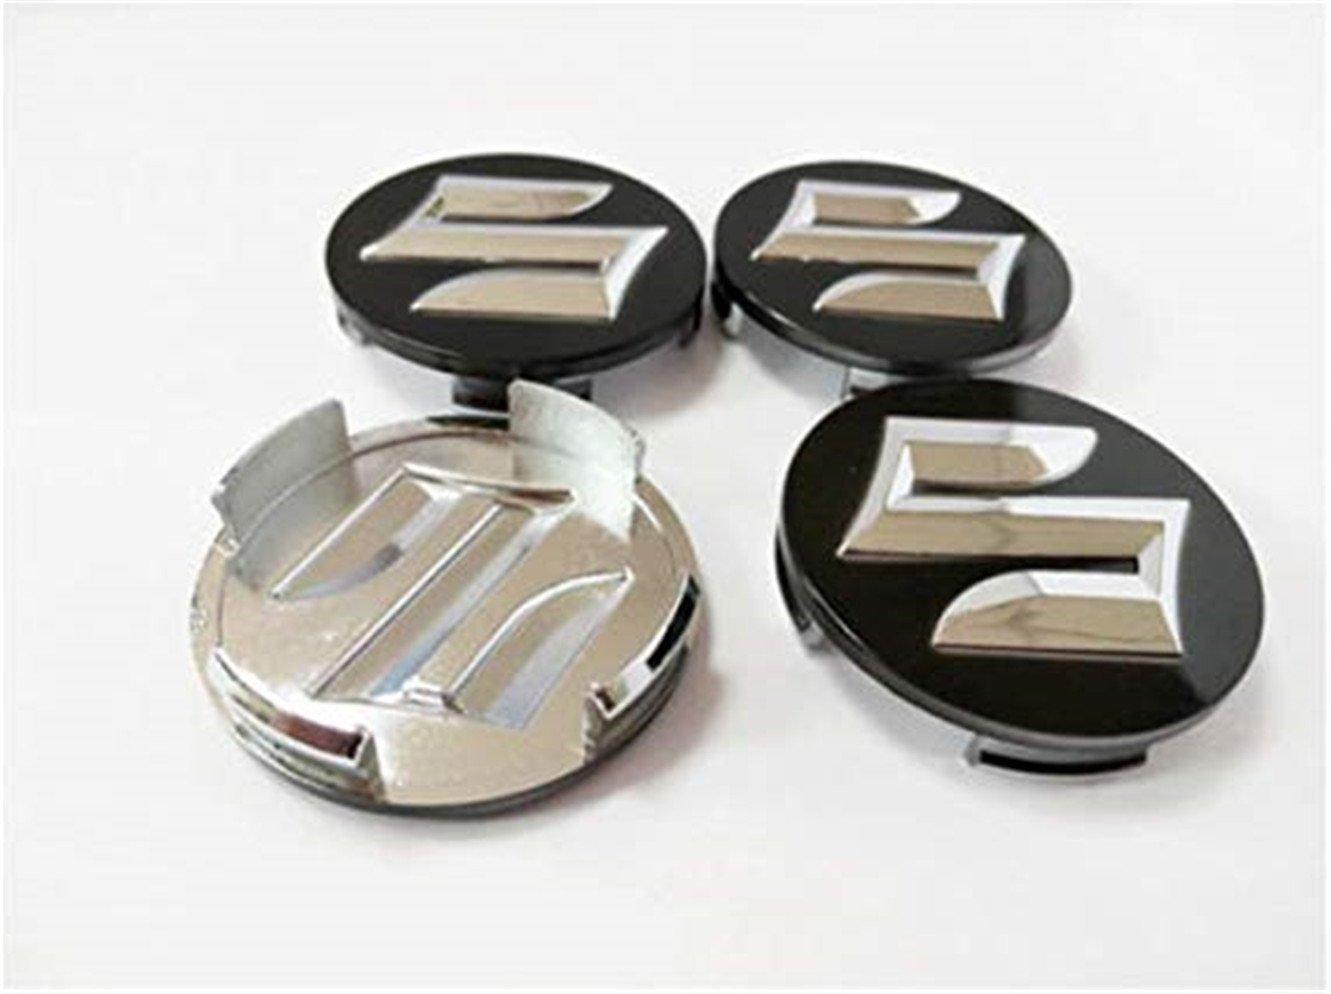 yongyong218 4pcs Black 54mm Car Styling Car Wheel Center Hub Caps for Suzuki Wheel Center: Amazon.es: Coche y moto